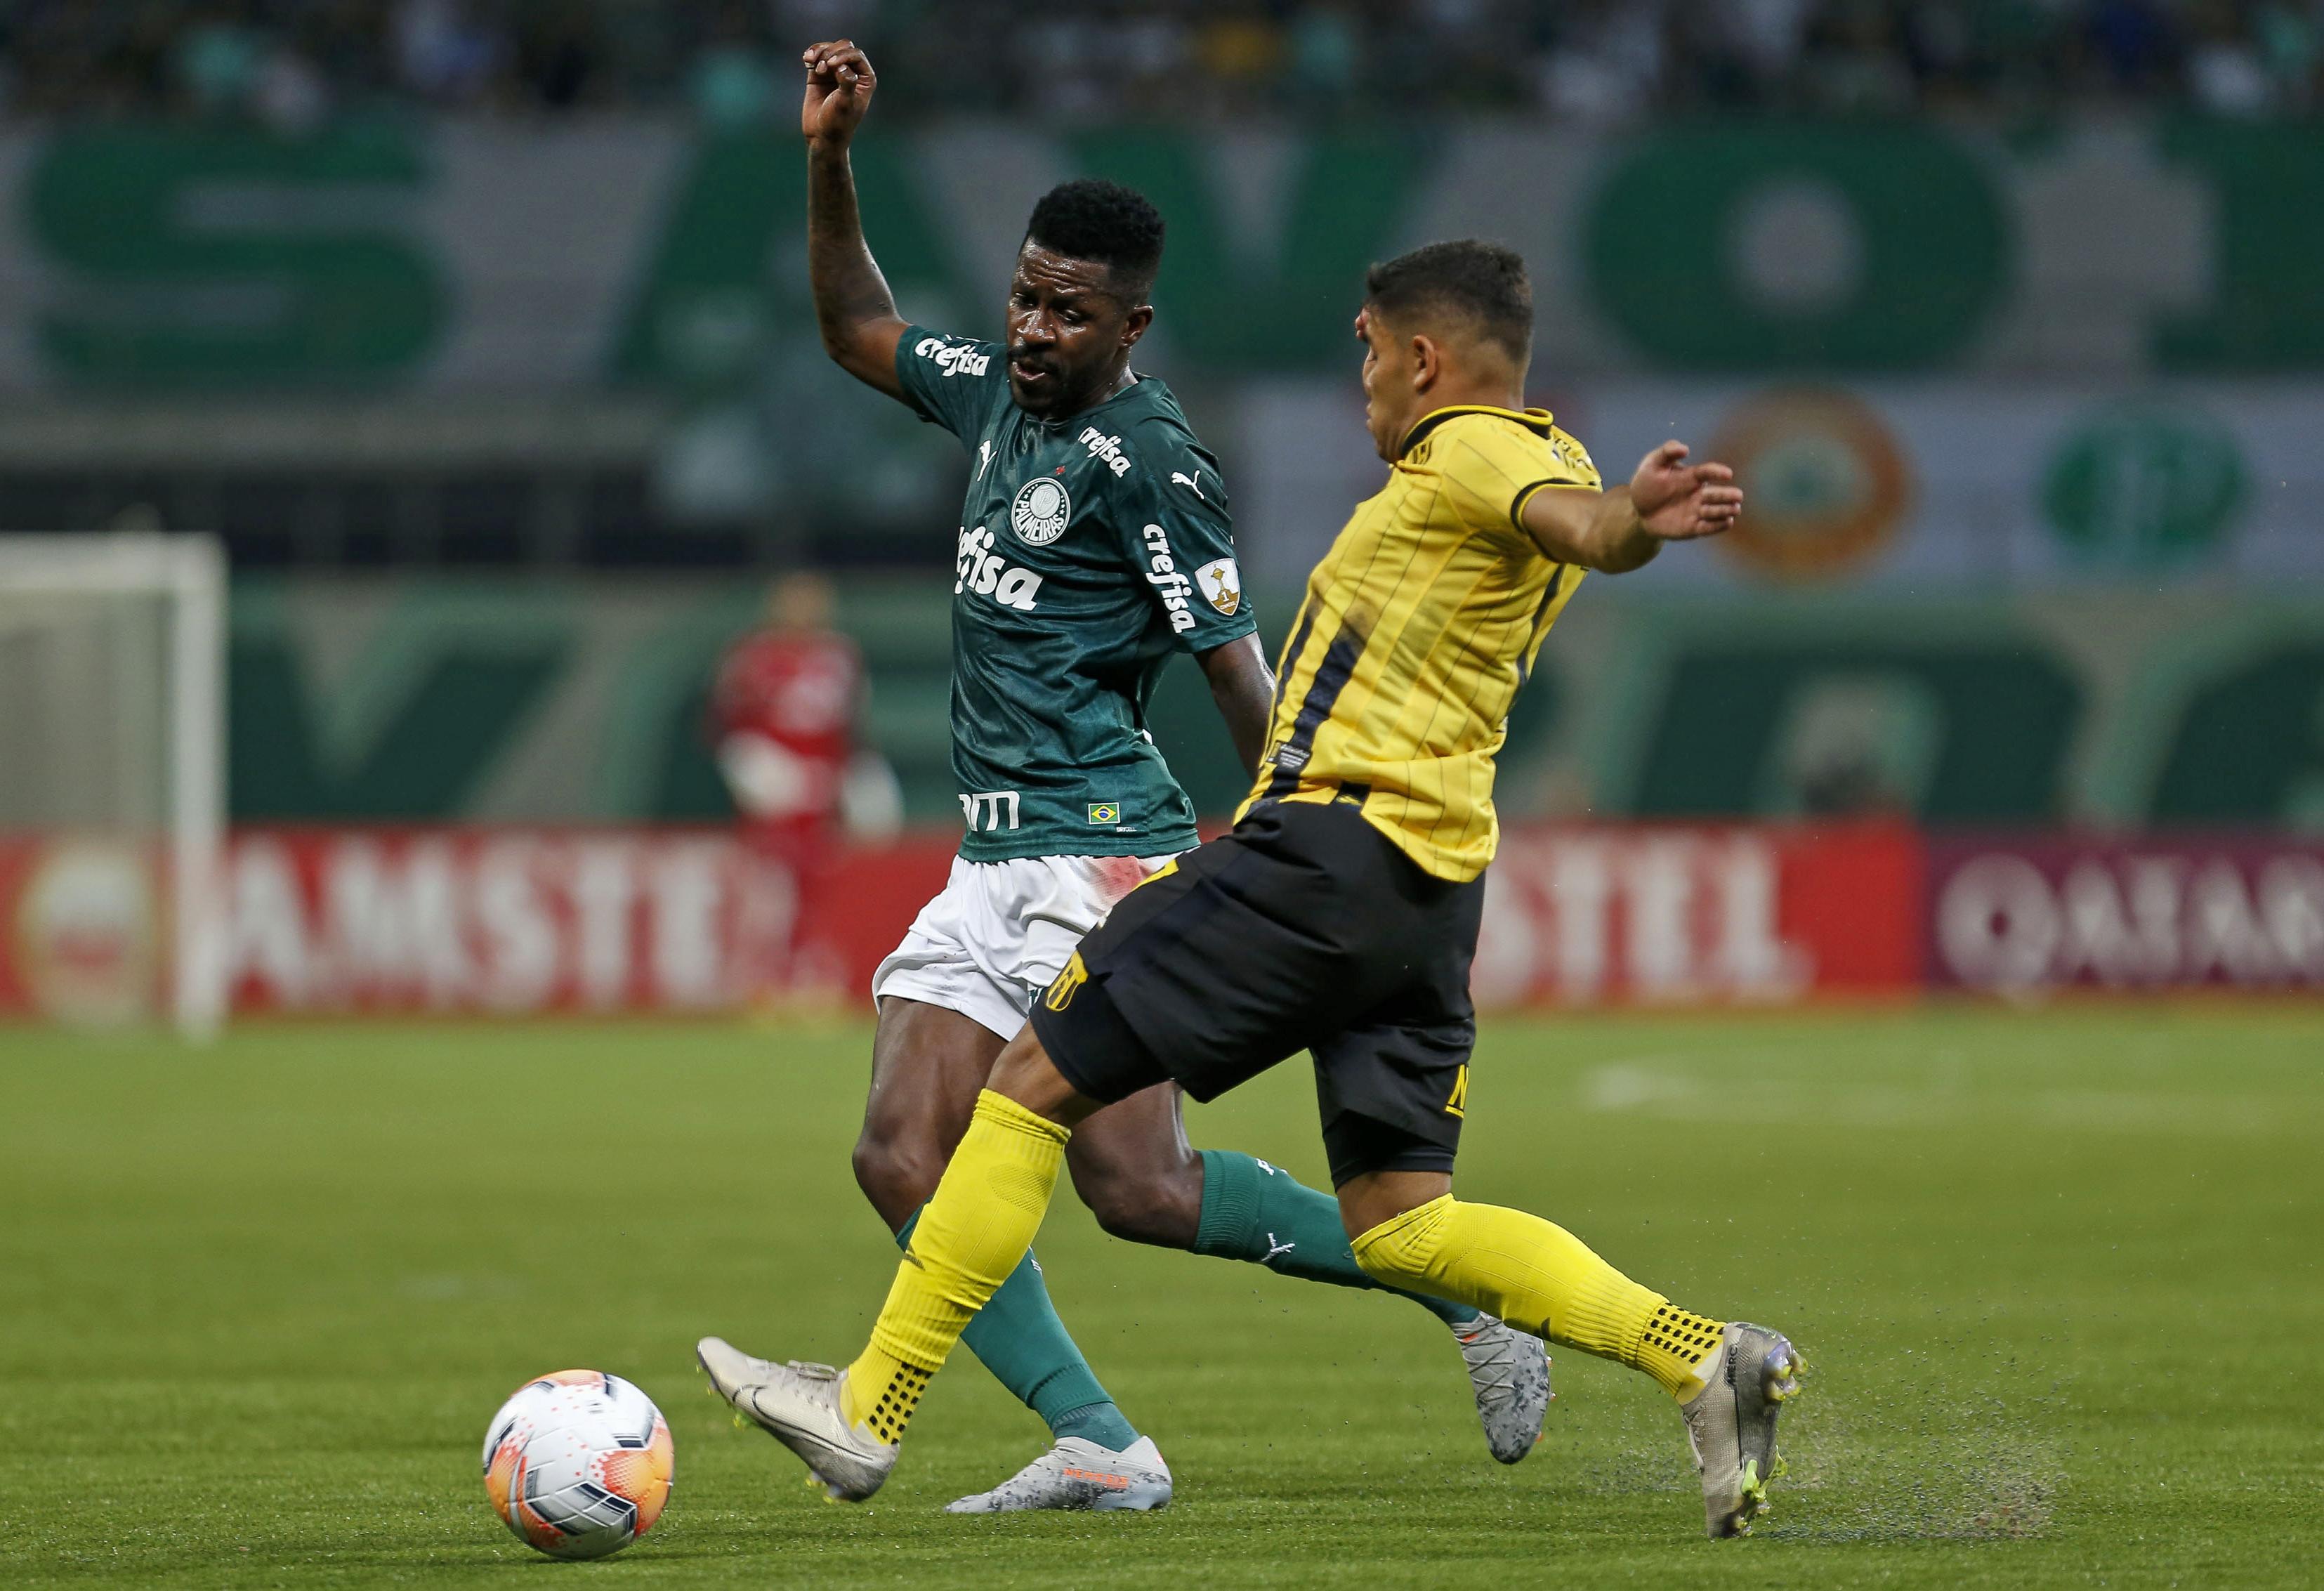 Palmeiras  - Guaraní